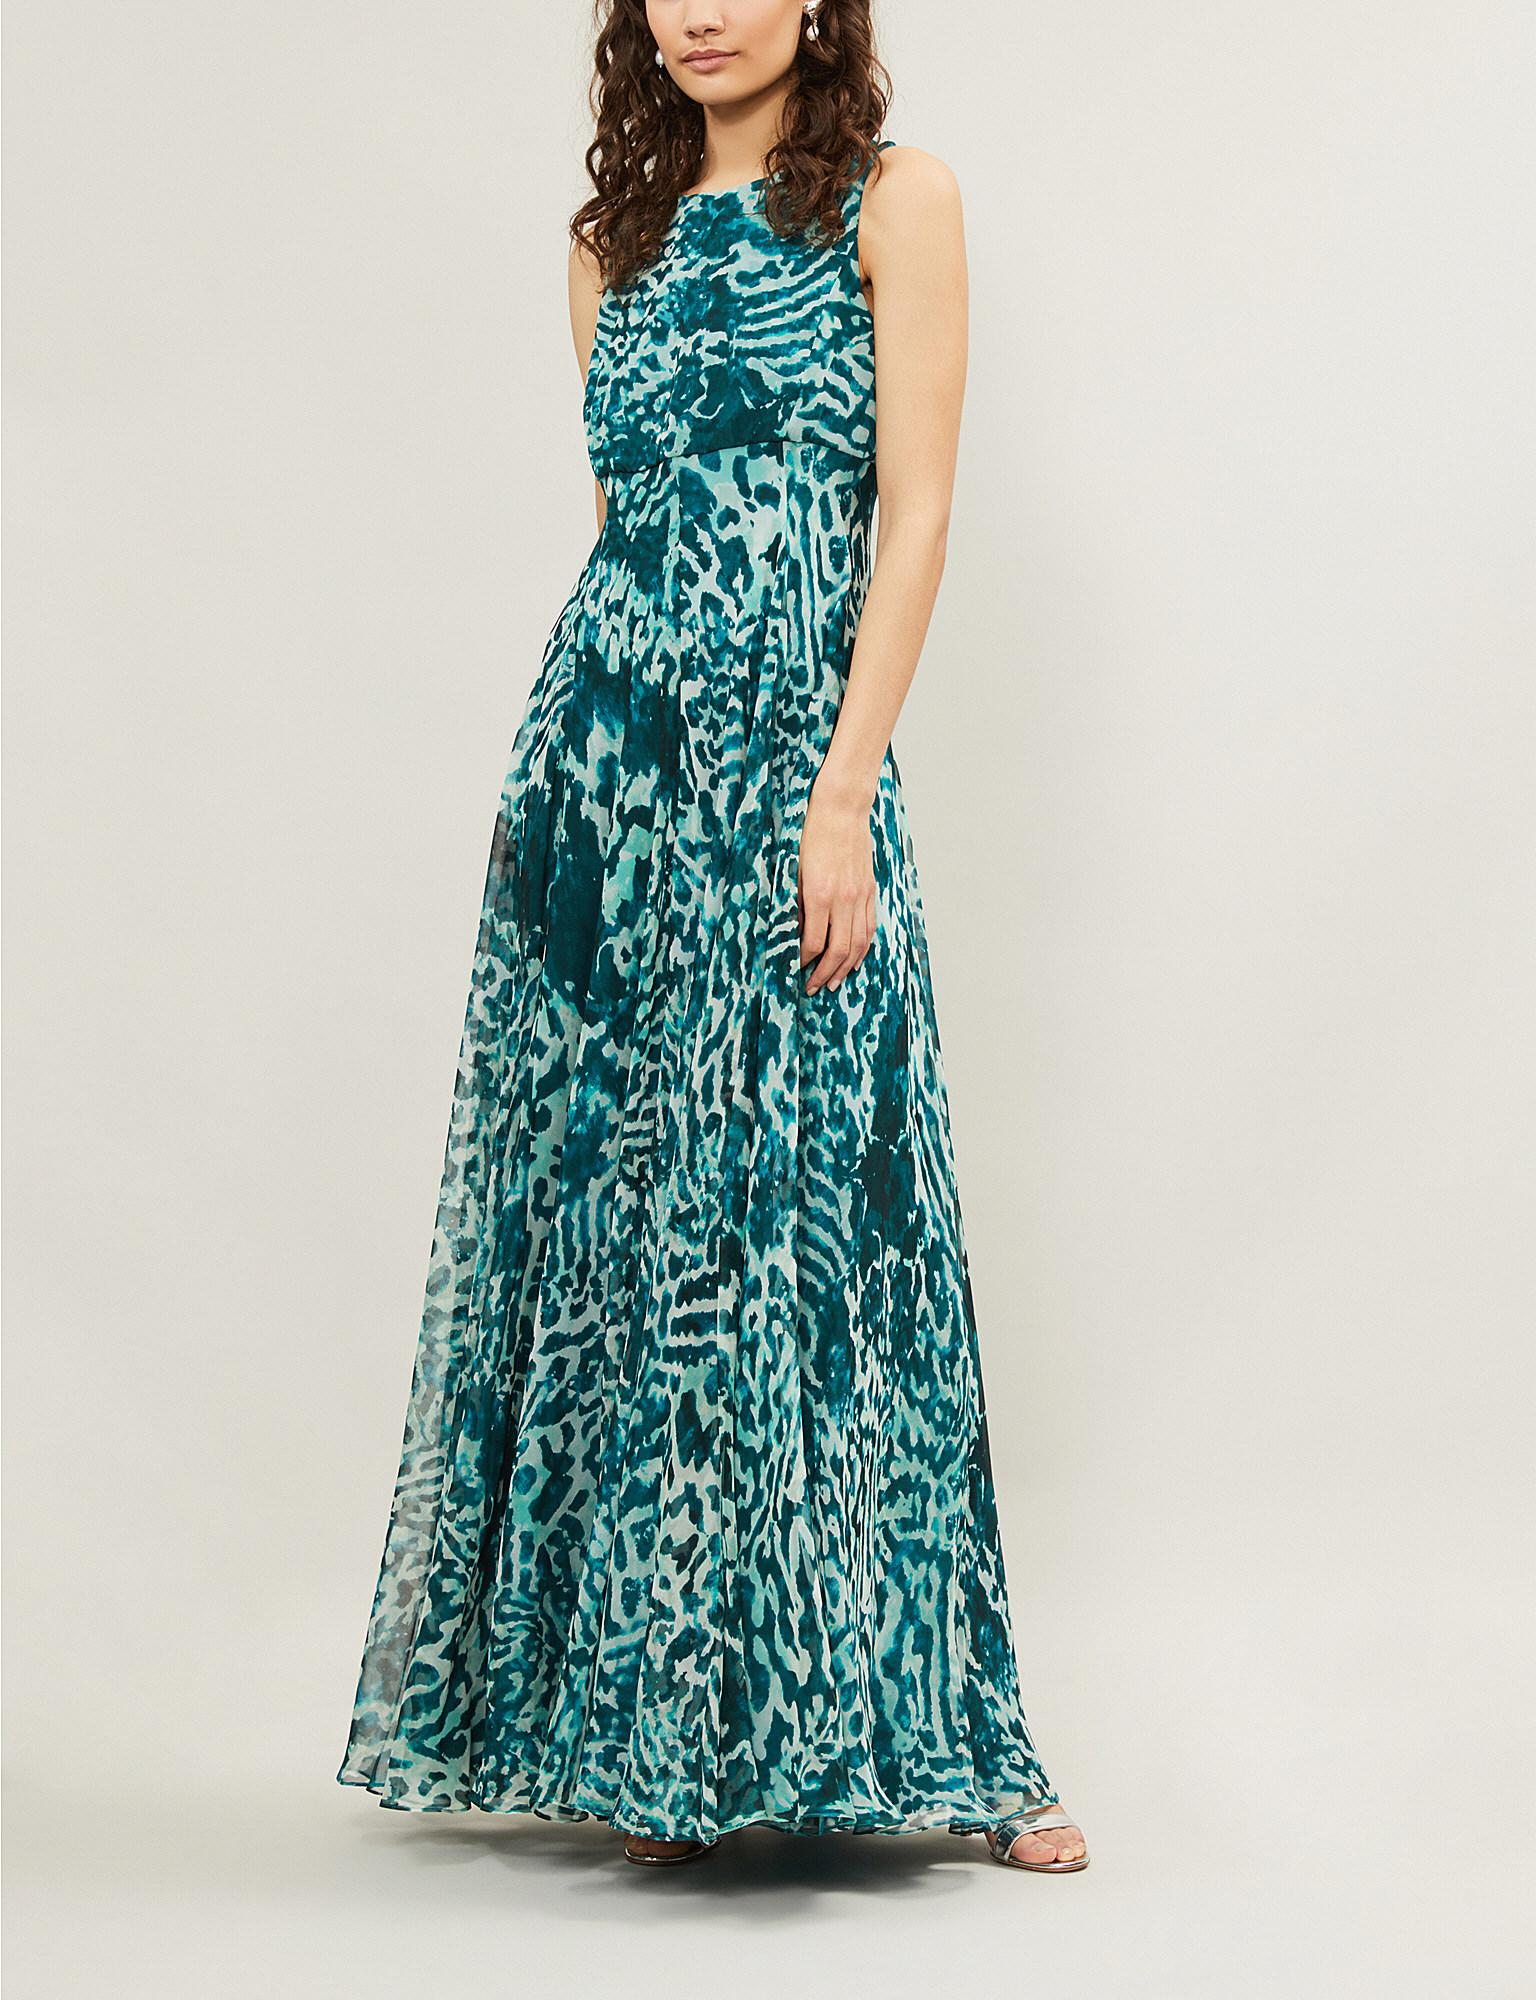 1a1b55b1bfa Lyst - Max Mara Elegante Lugano Leopard-print Silk Maxi Dress in Green